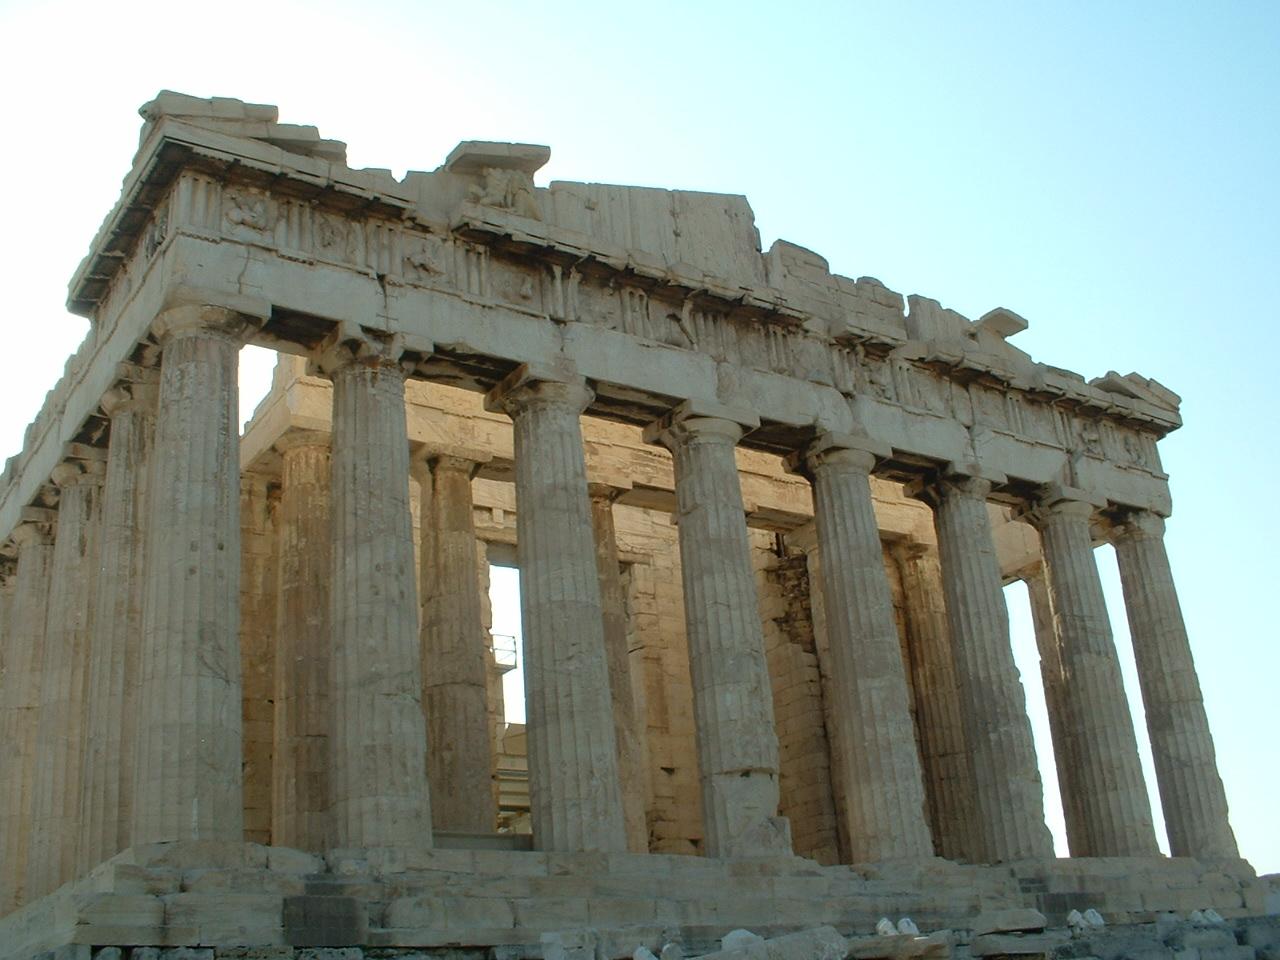 http://www.themirl.com/images/Acropolis_21.JPG